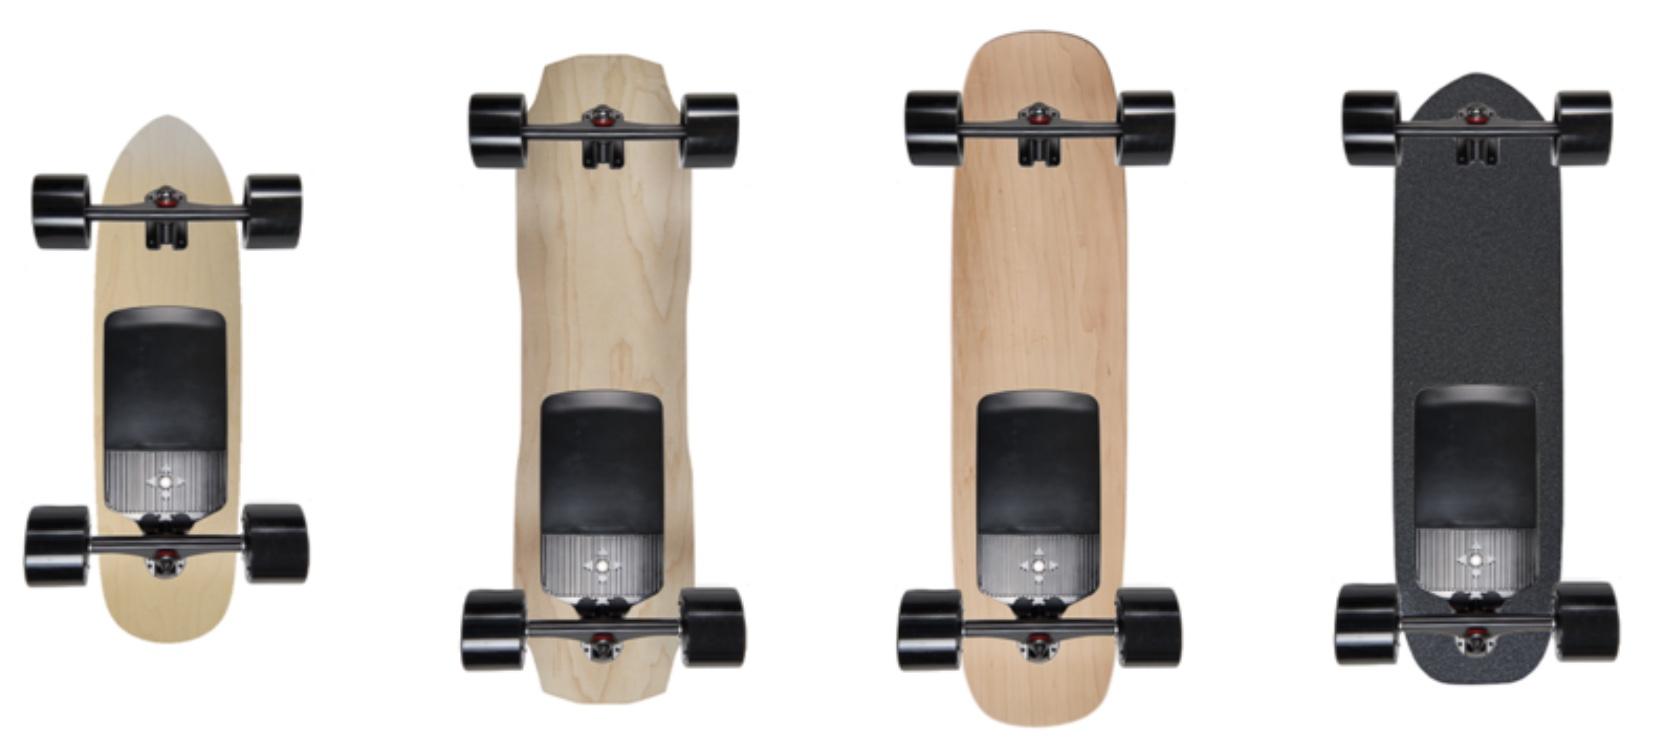 Ivory Electric Skateboards